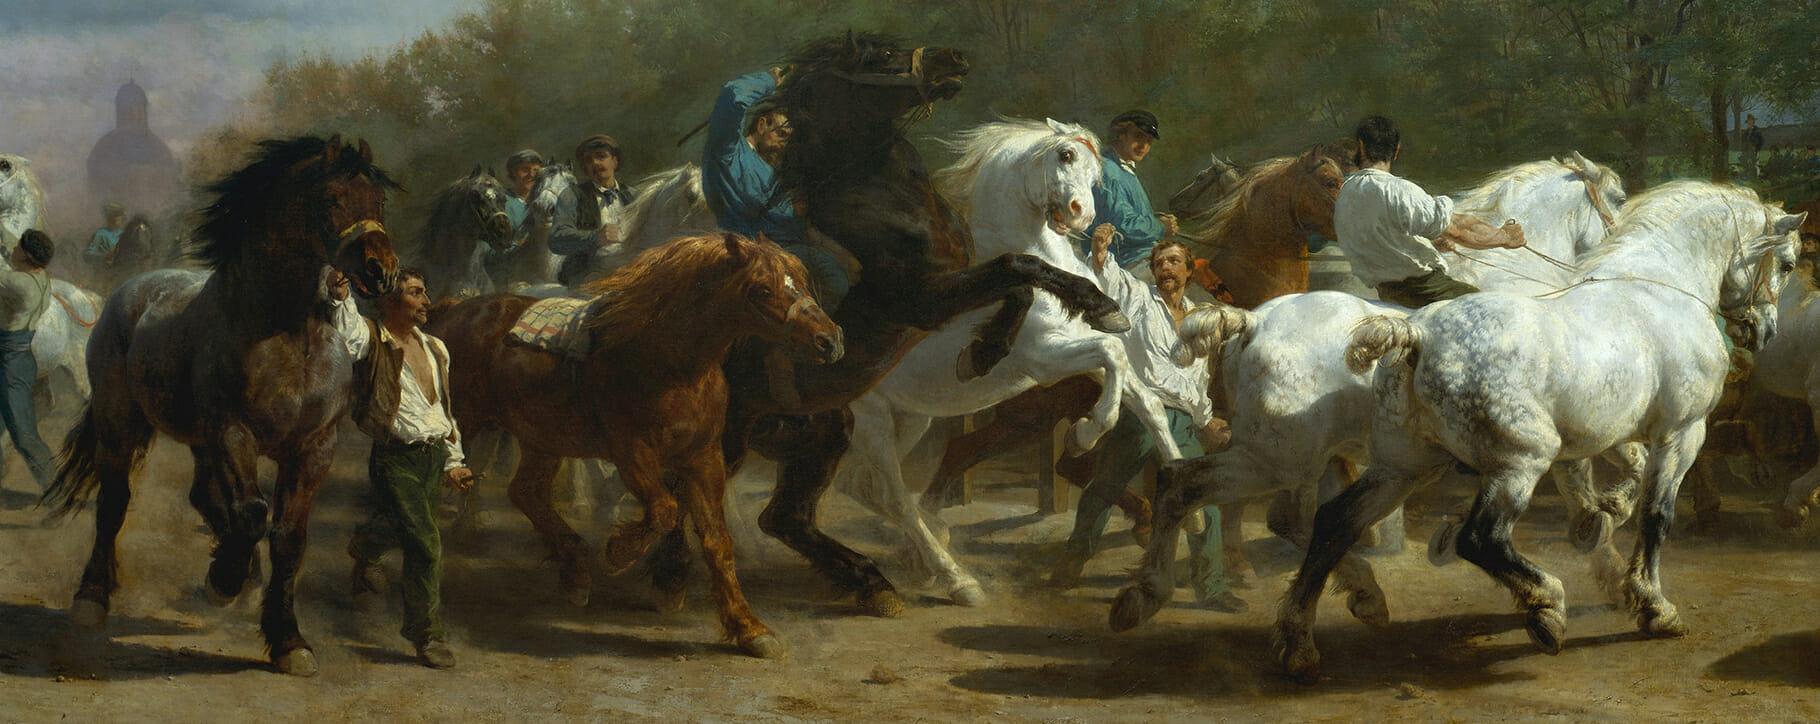 Horse Fair 19th Century